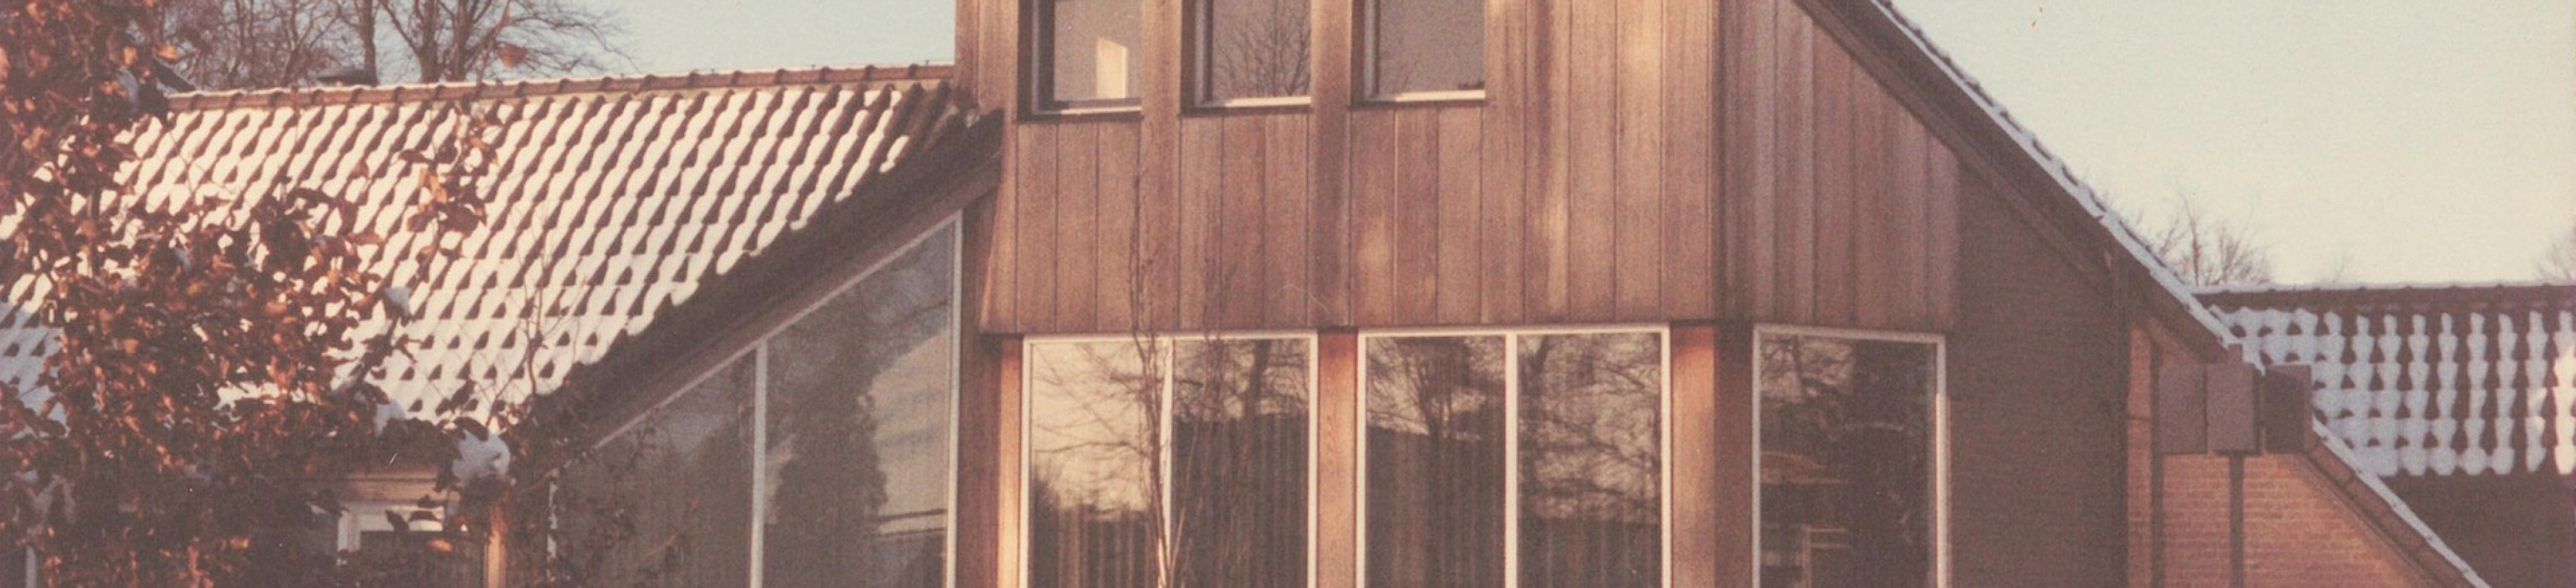 De Spinde Dalen achterzijde 1989